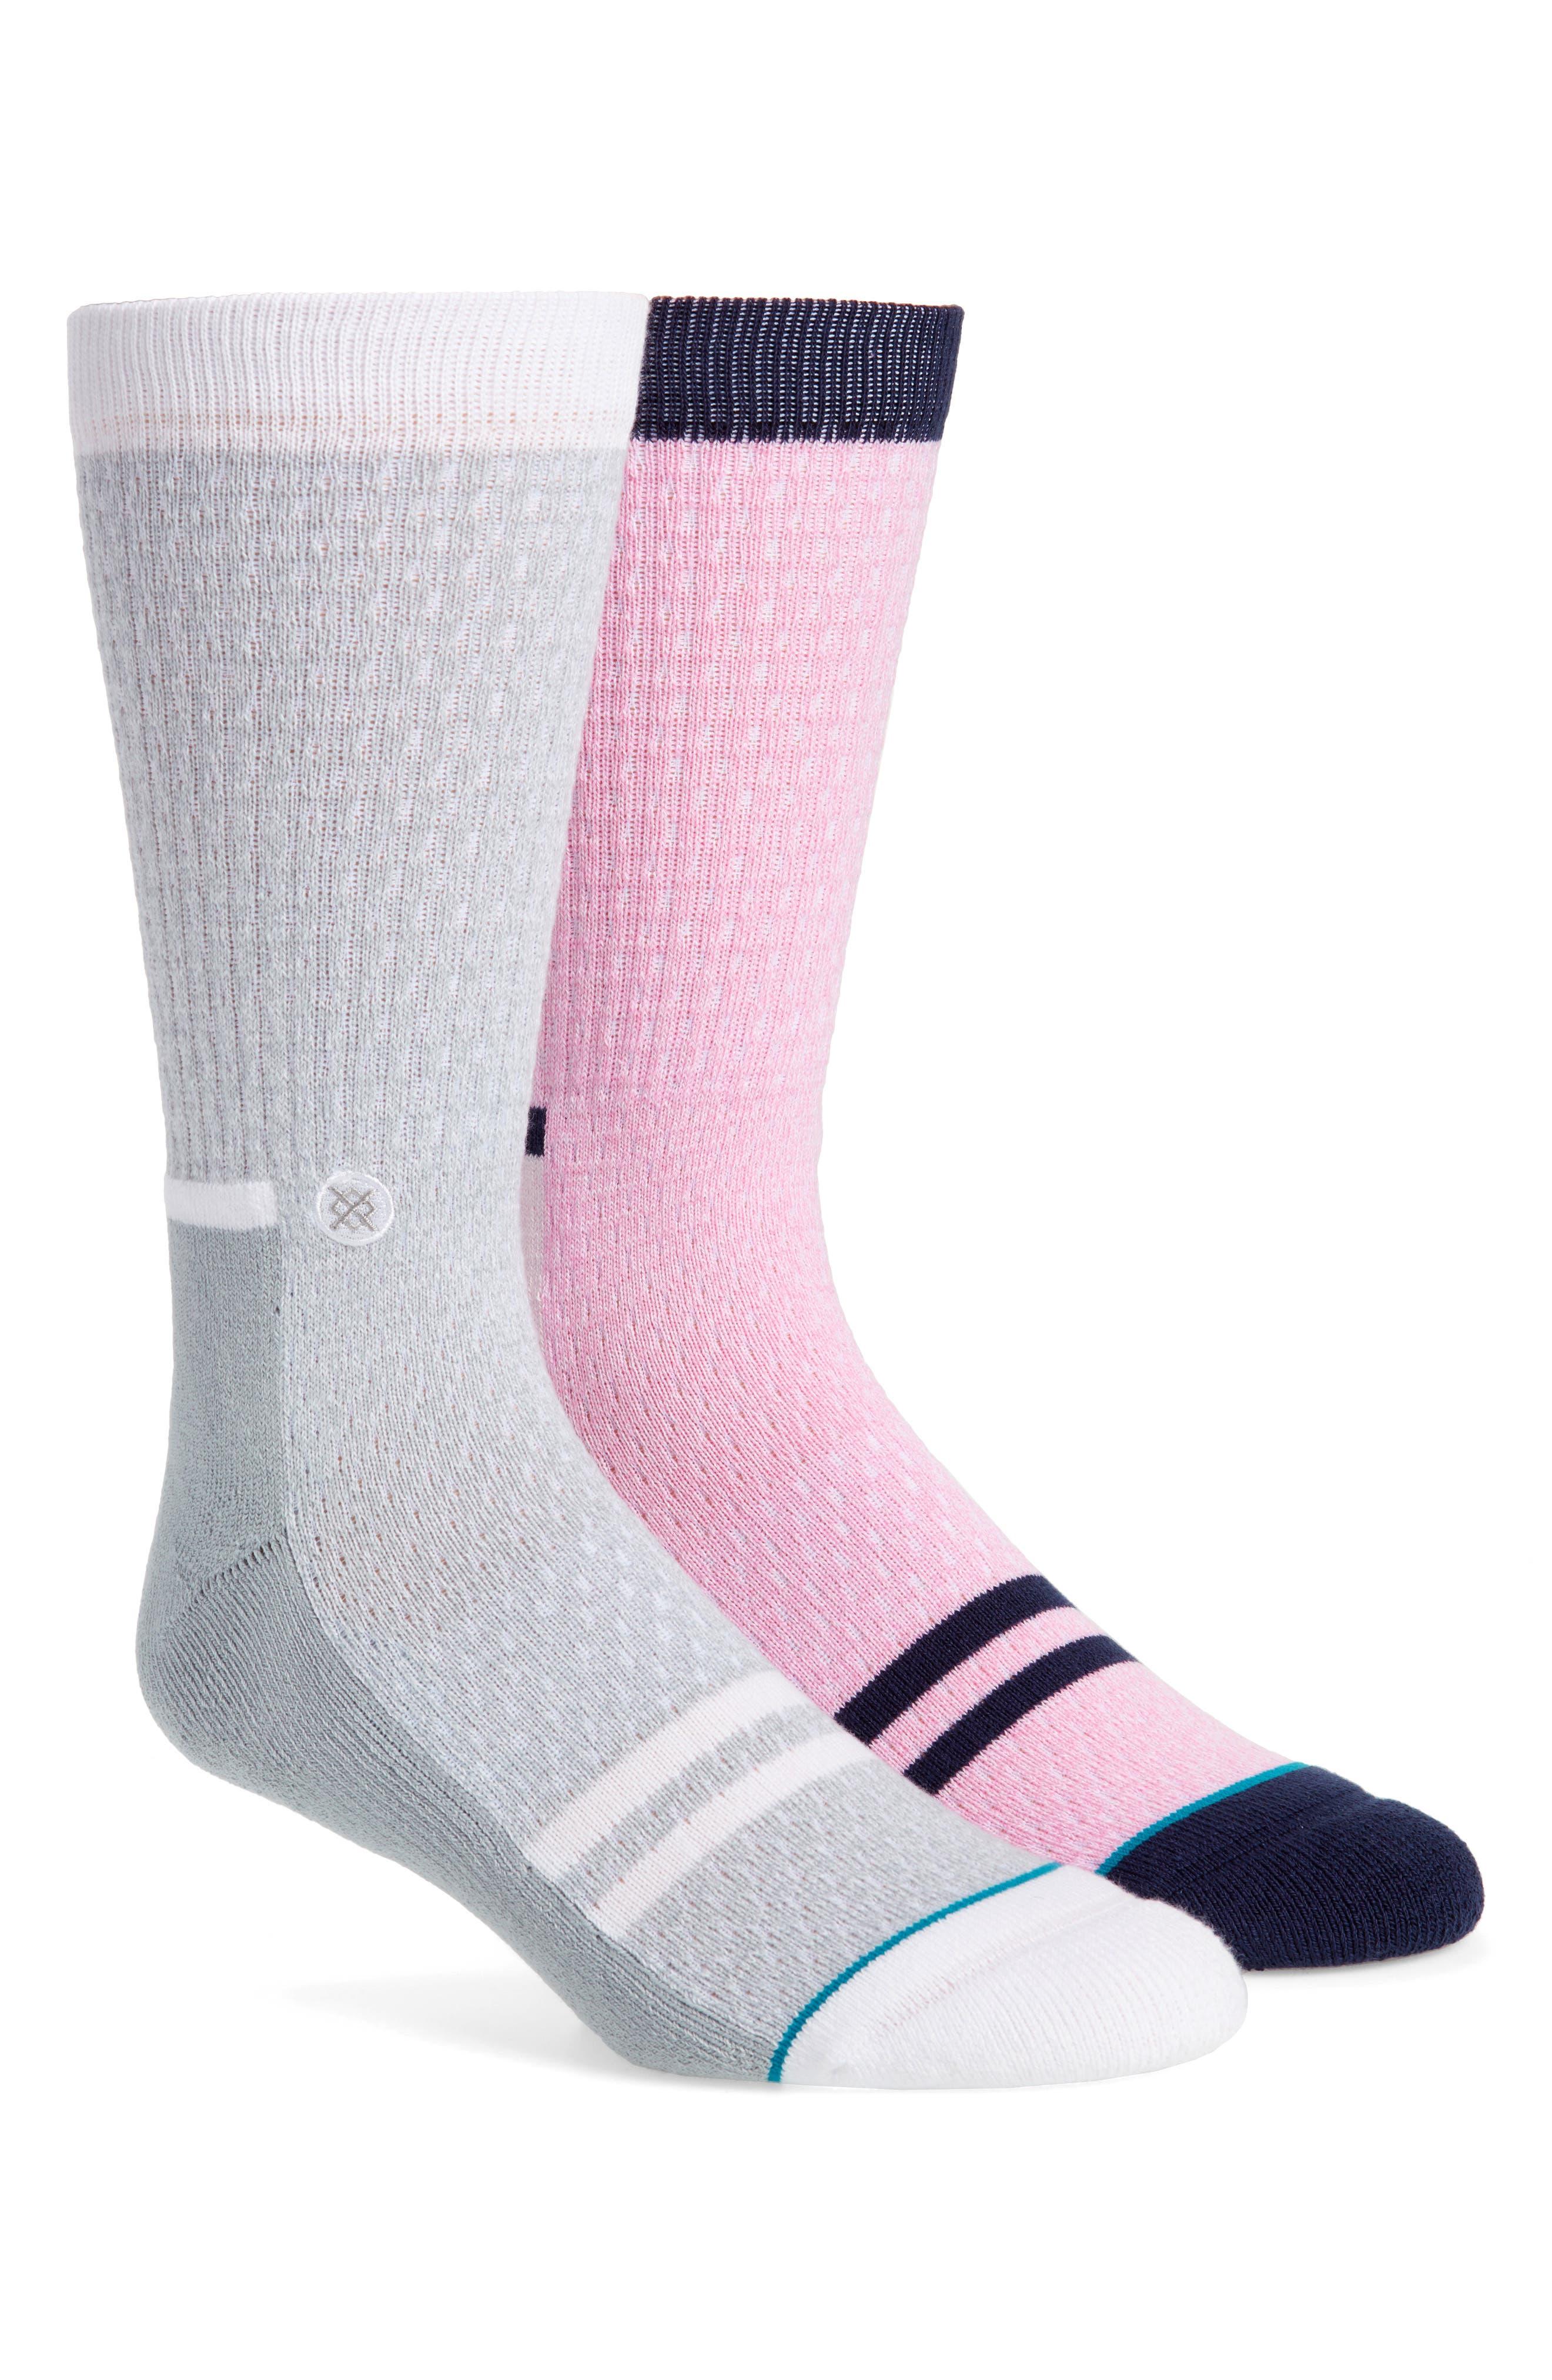 Main Image - Stance Lance Stripe Crew Socks